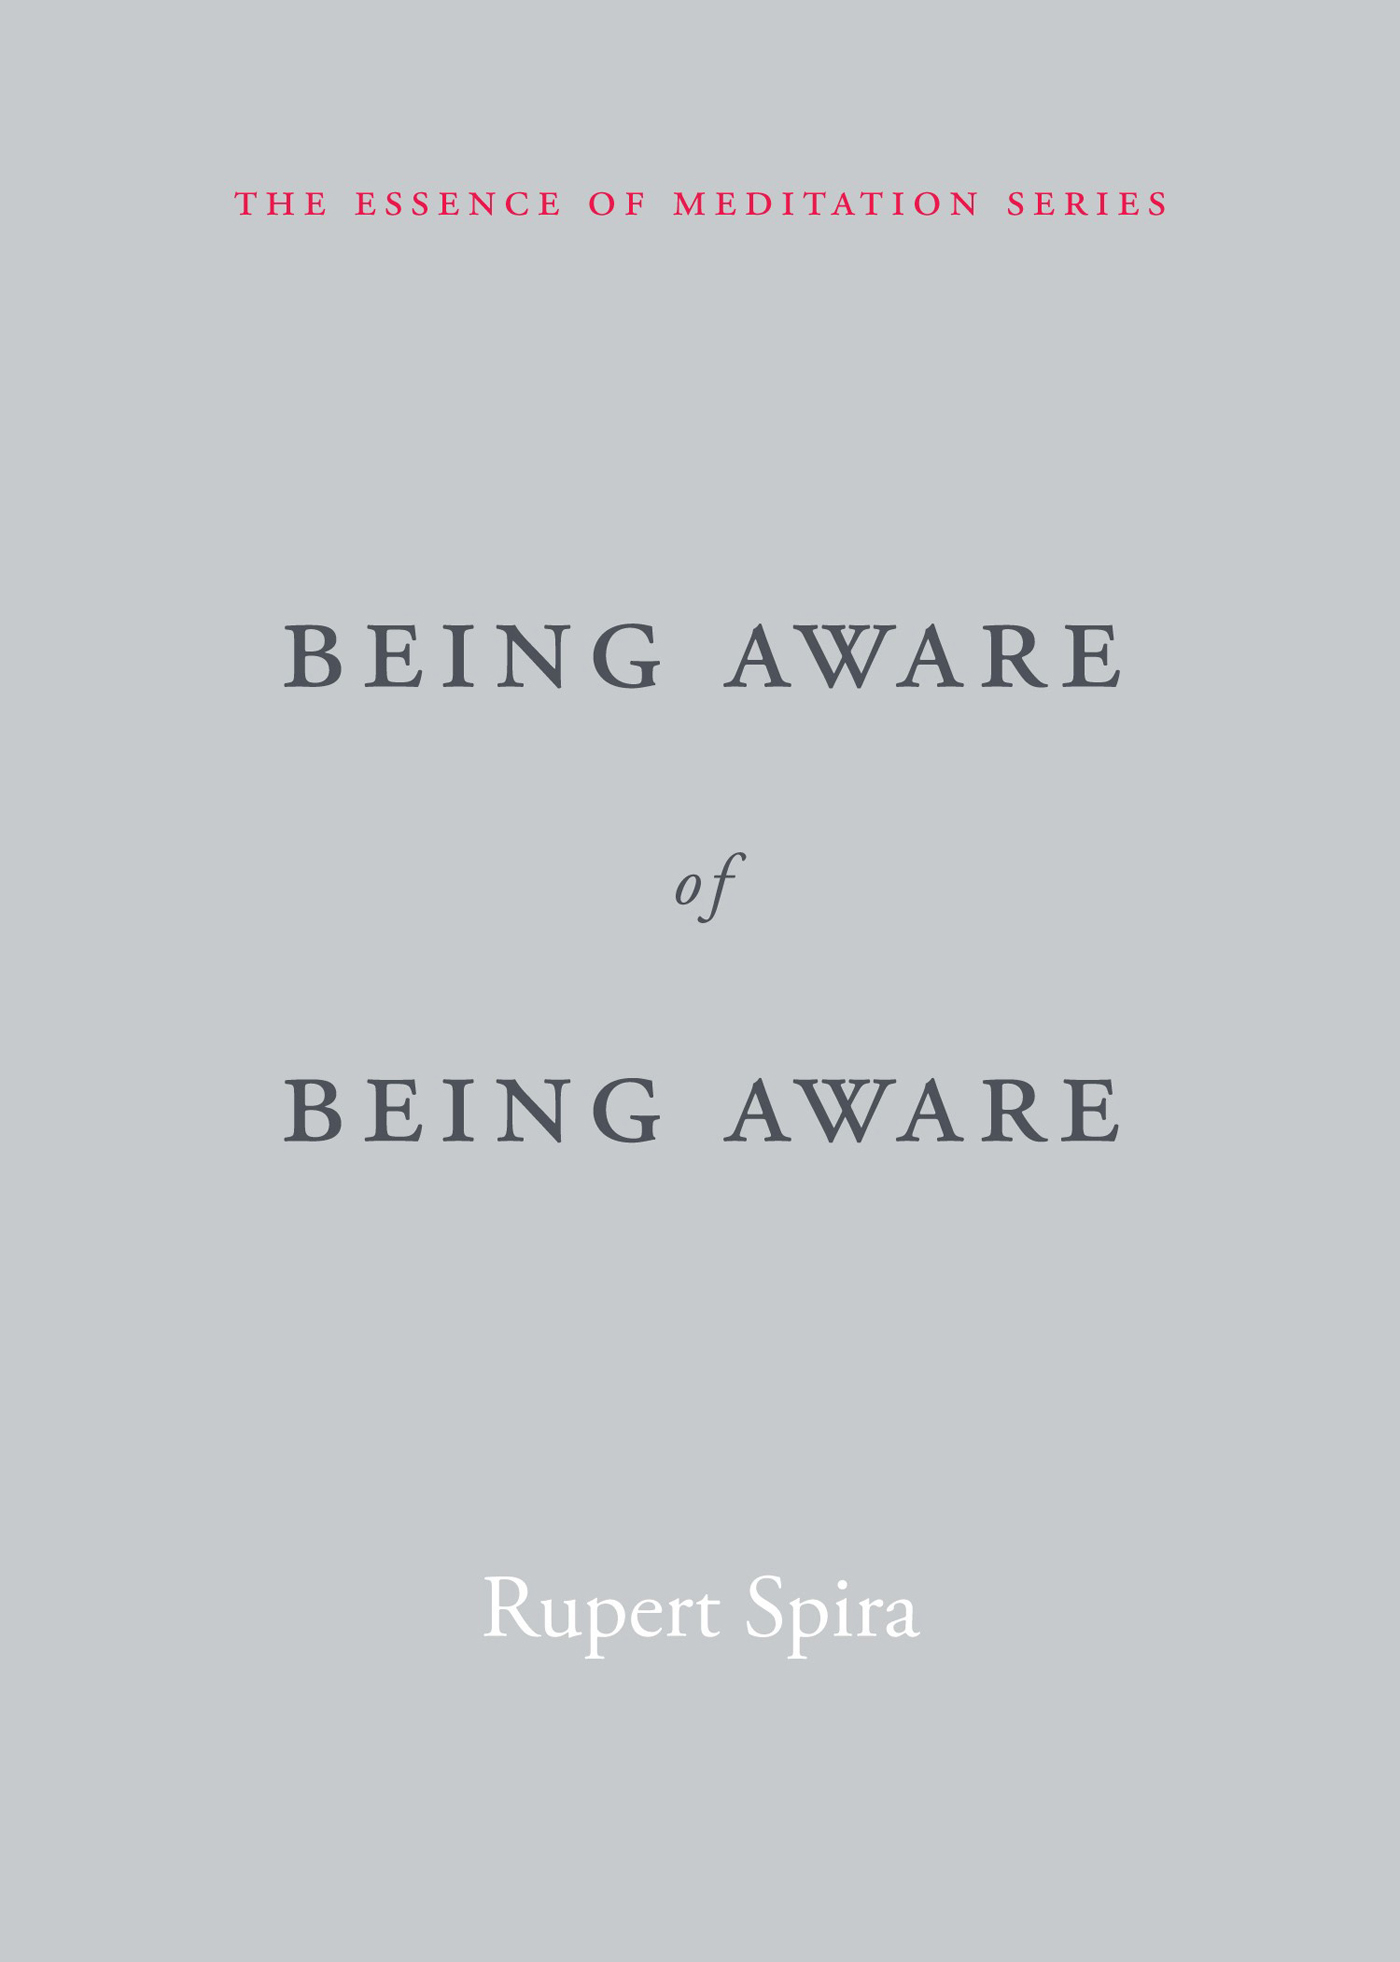 Being Aware of Being Aware